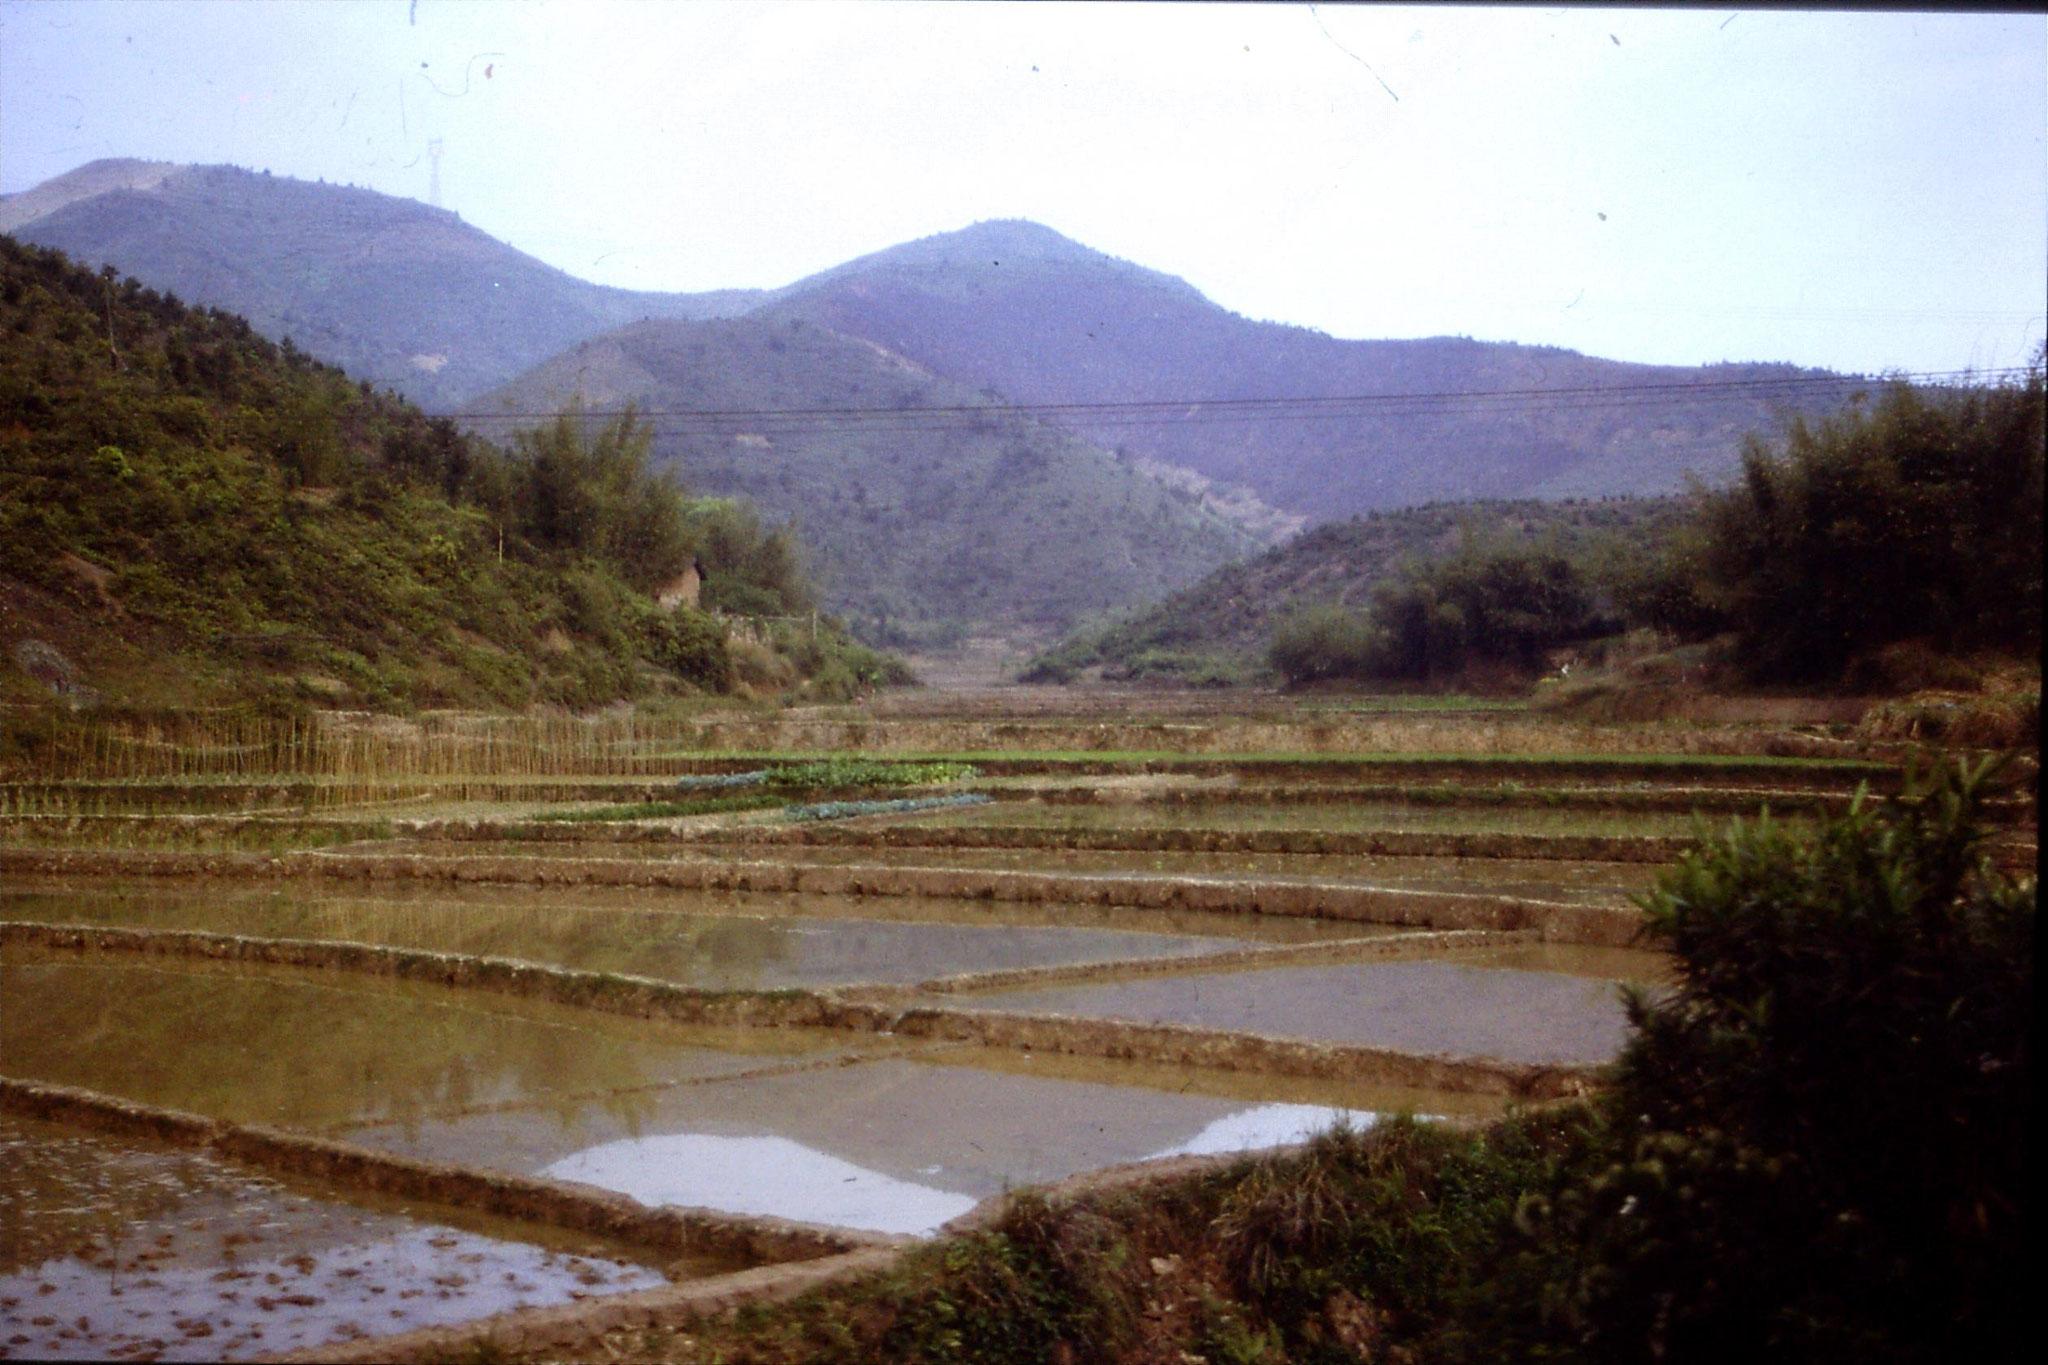 29/3/1989: 8: Fujian 0950